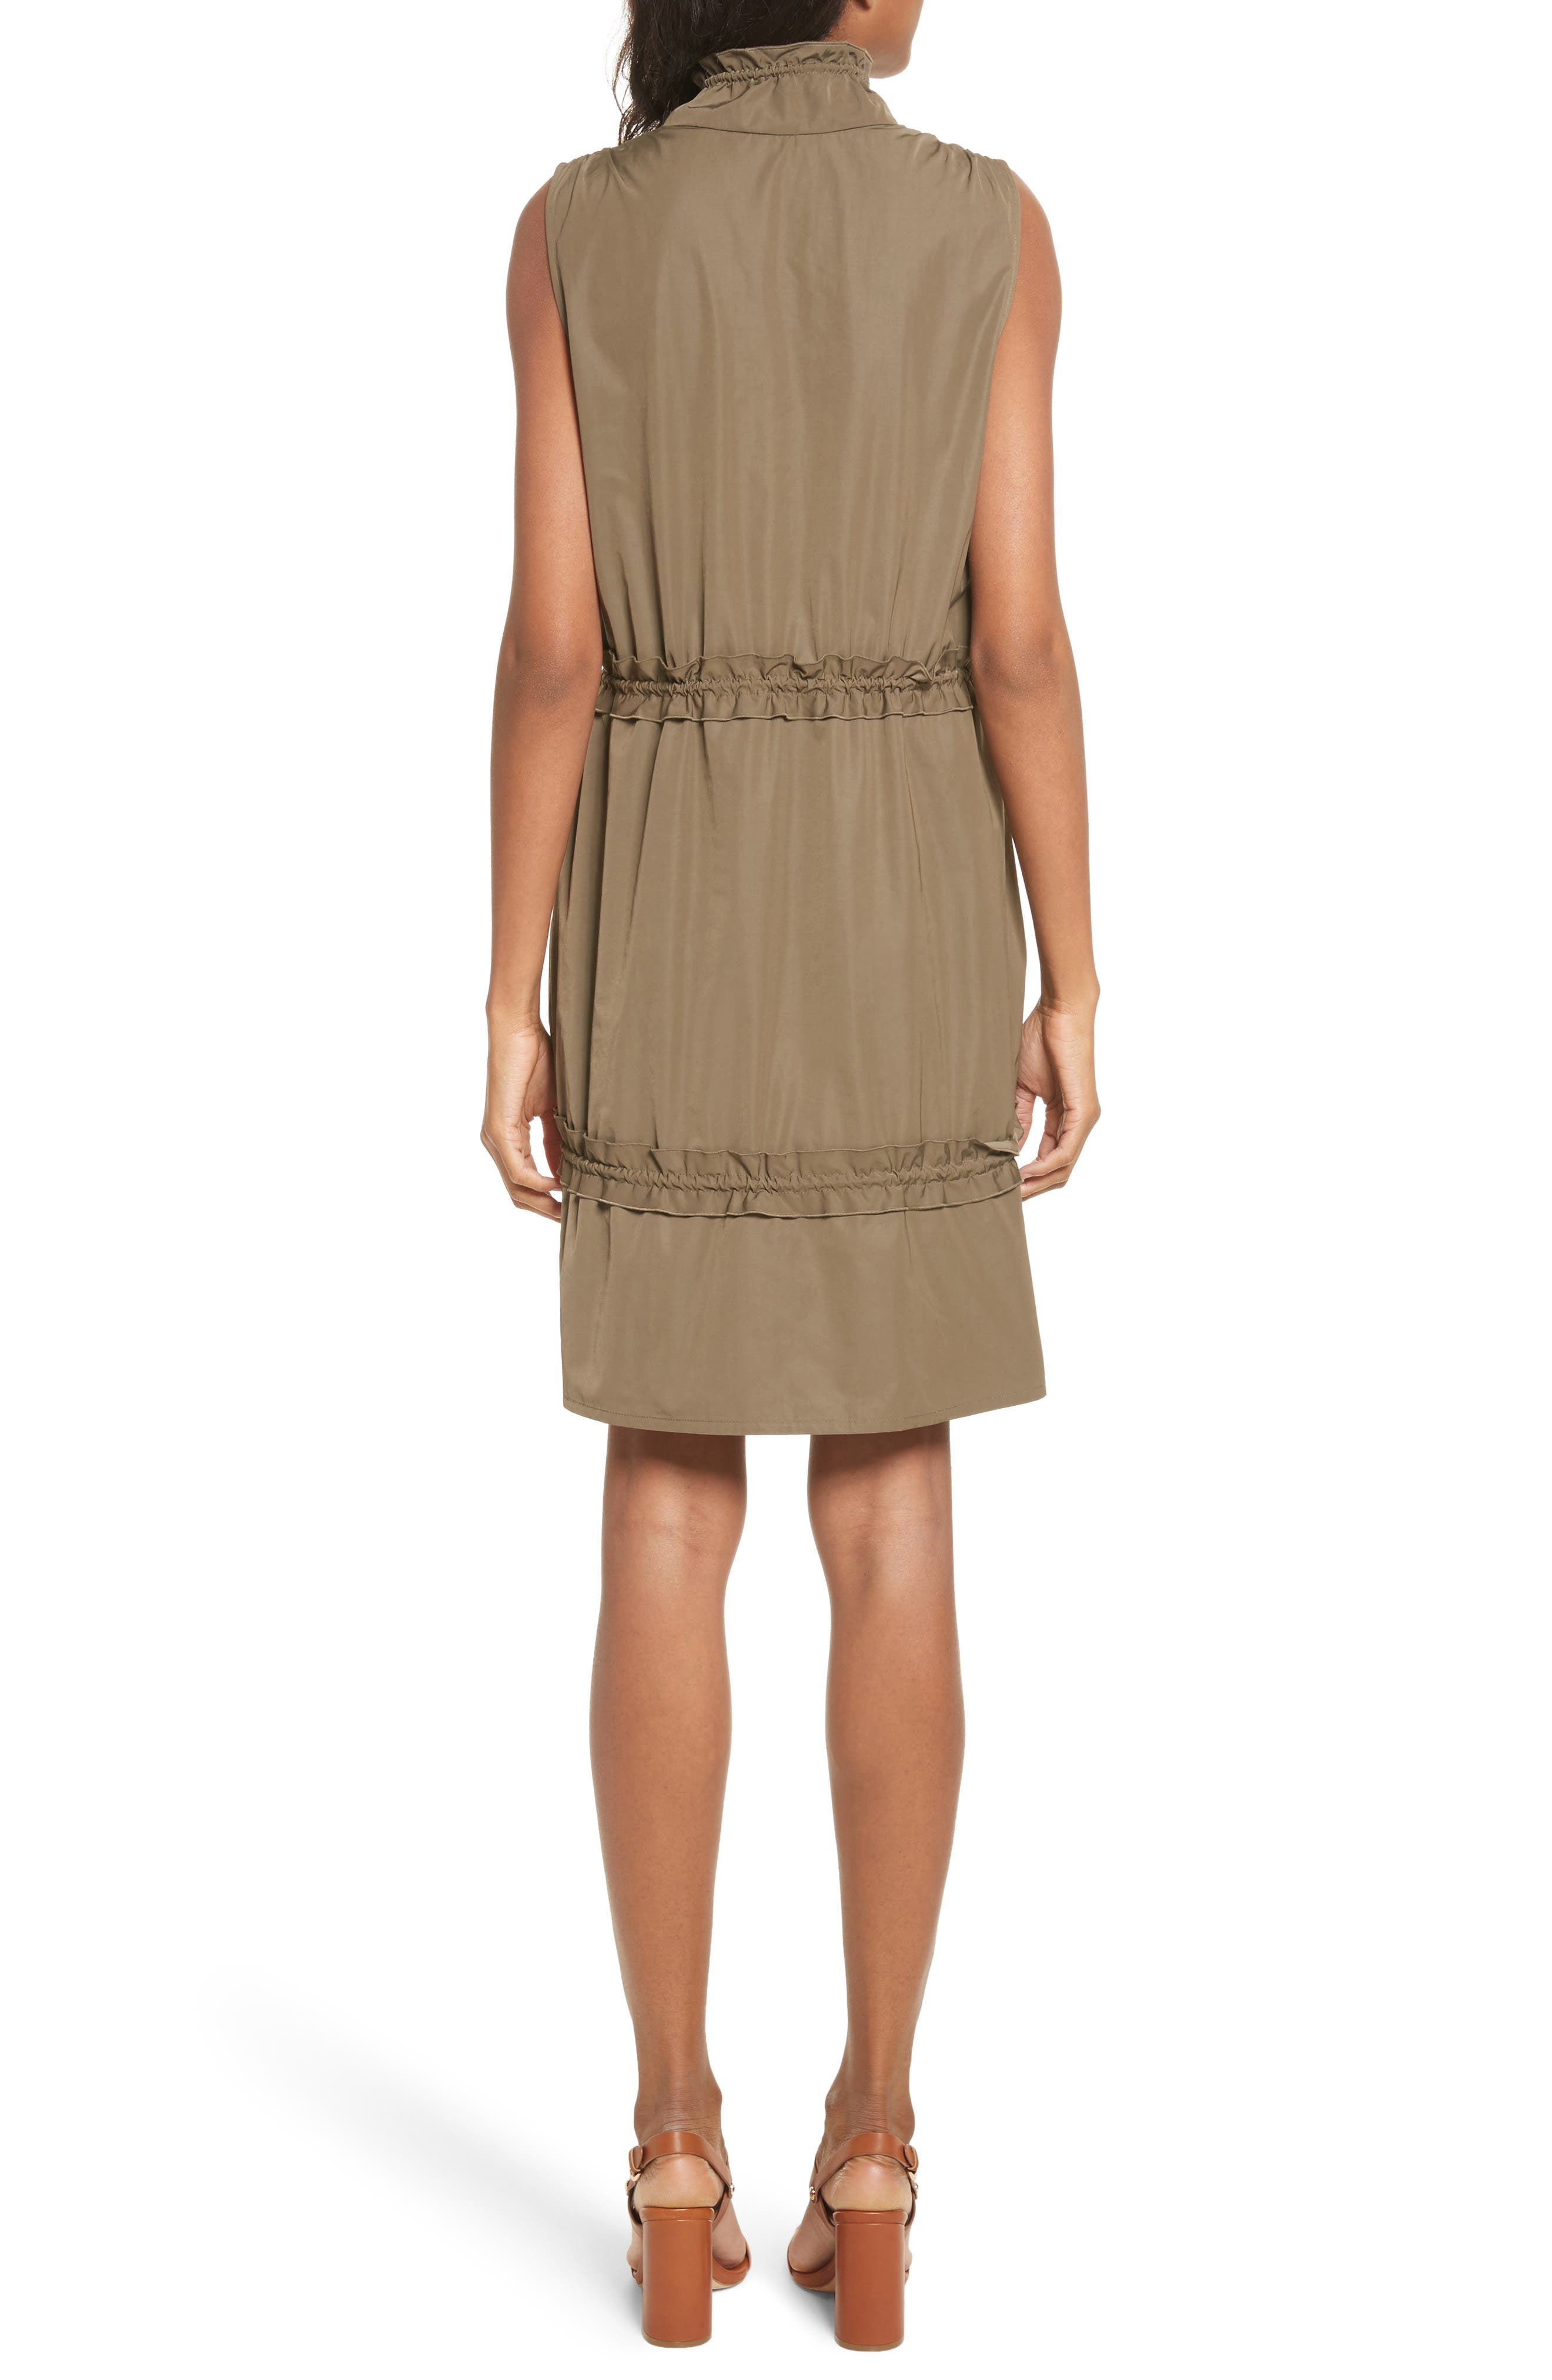 Cinch Waist Army Dress,                             Alternate thumbnail 2, color,                             Cacao Brown